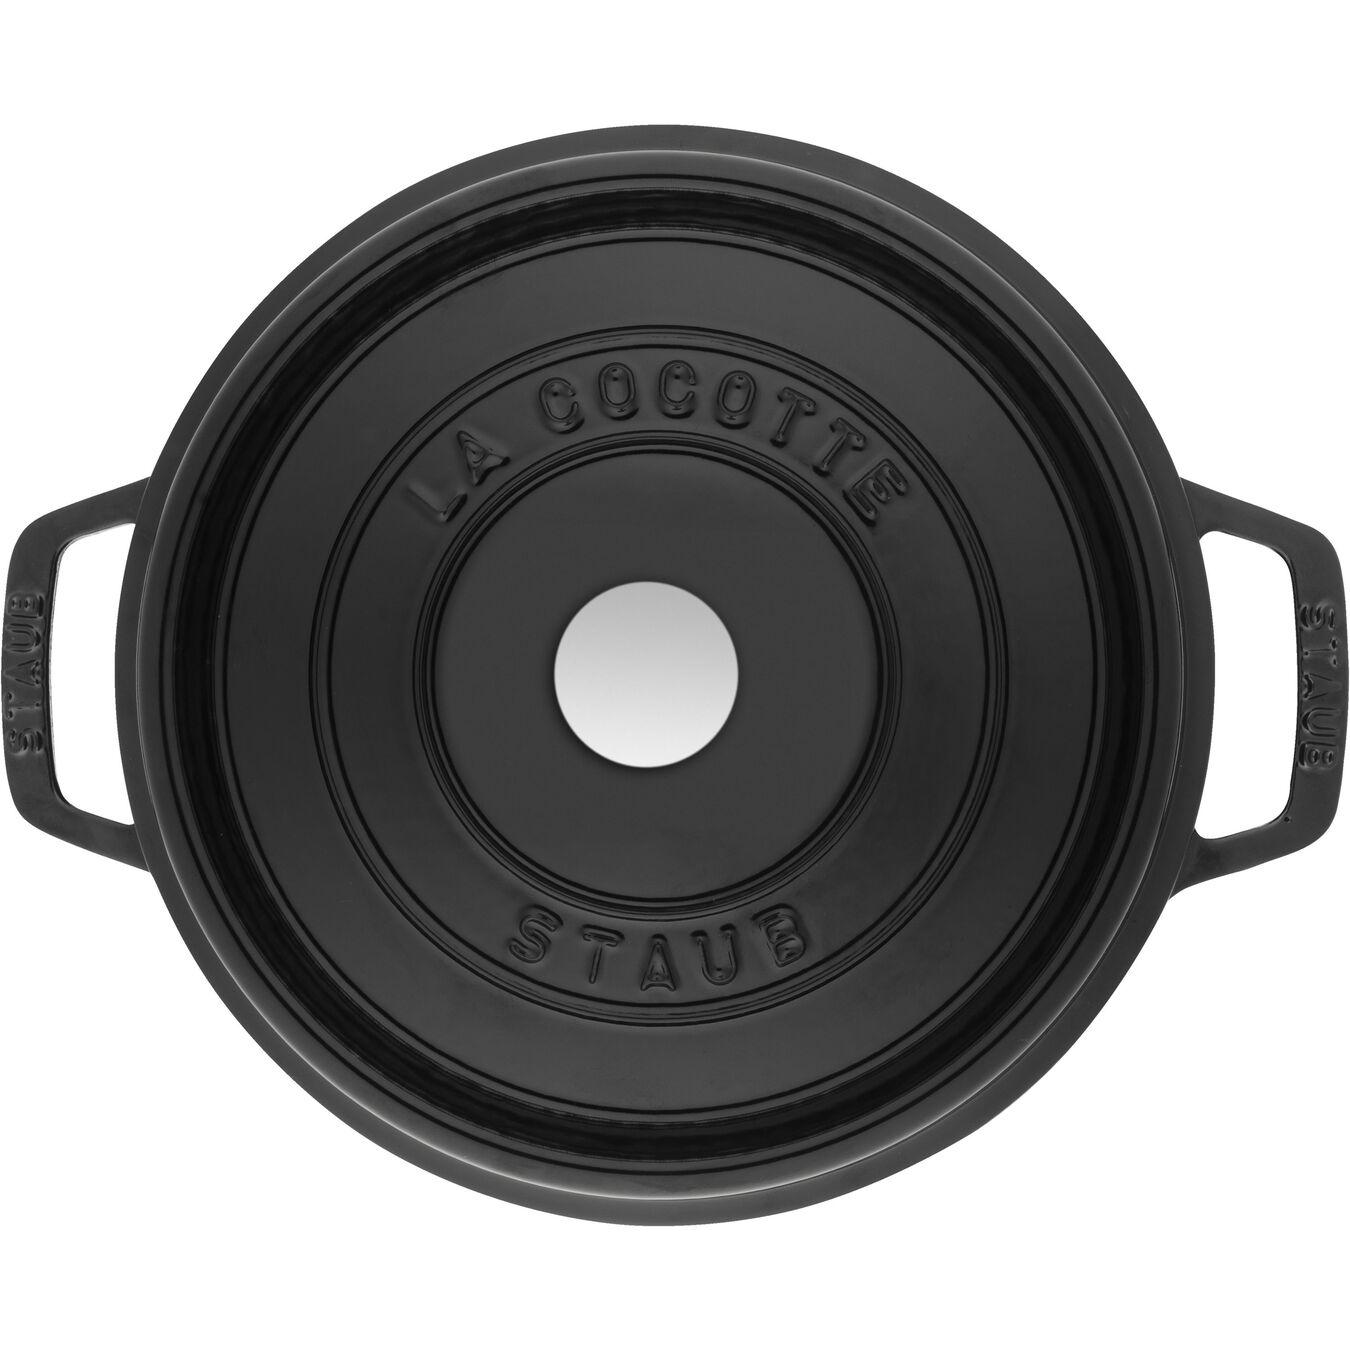 4.75 l Cast iron round Cocotte, shiny-black,,large 5